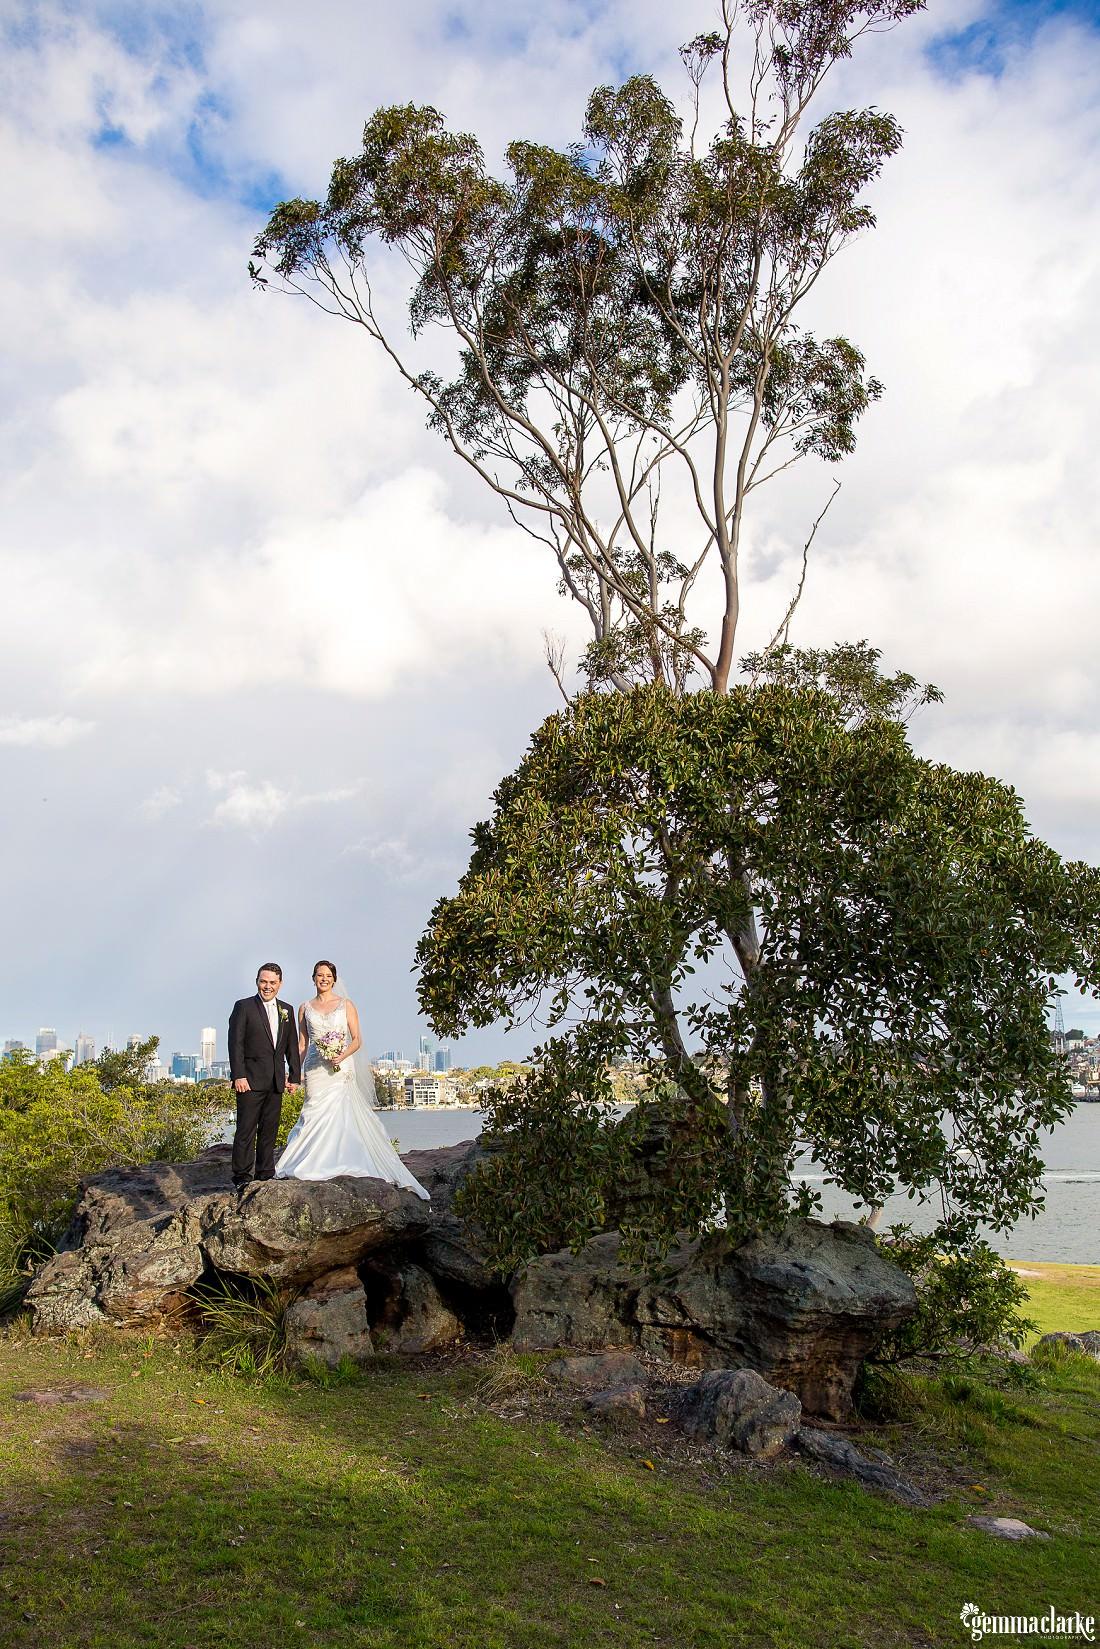 gemma-clarke-photography_deckhouse-woolwich-wedding_clarkes-point-reserve-wedding_natalie-and-chris_0032